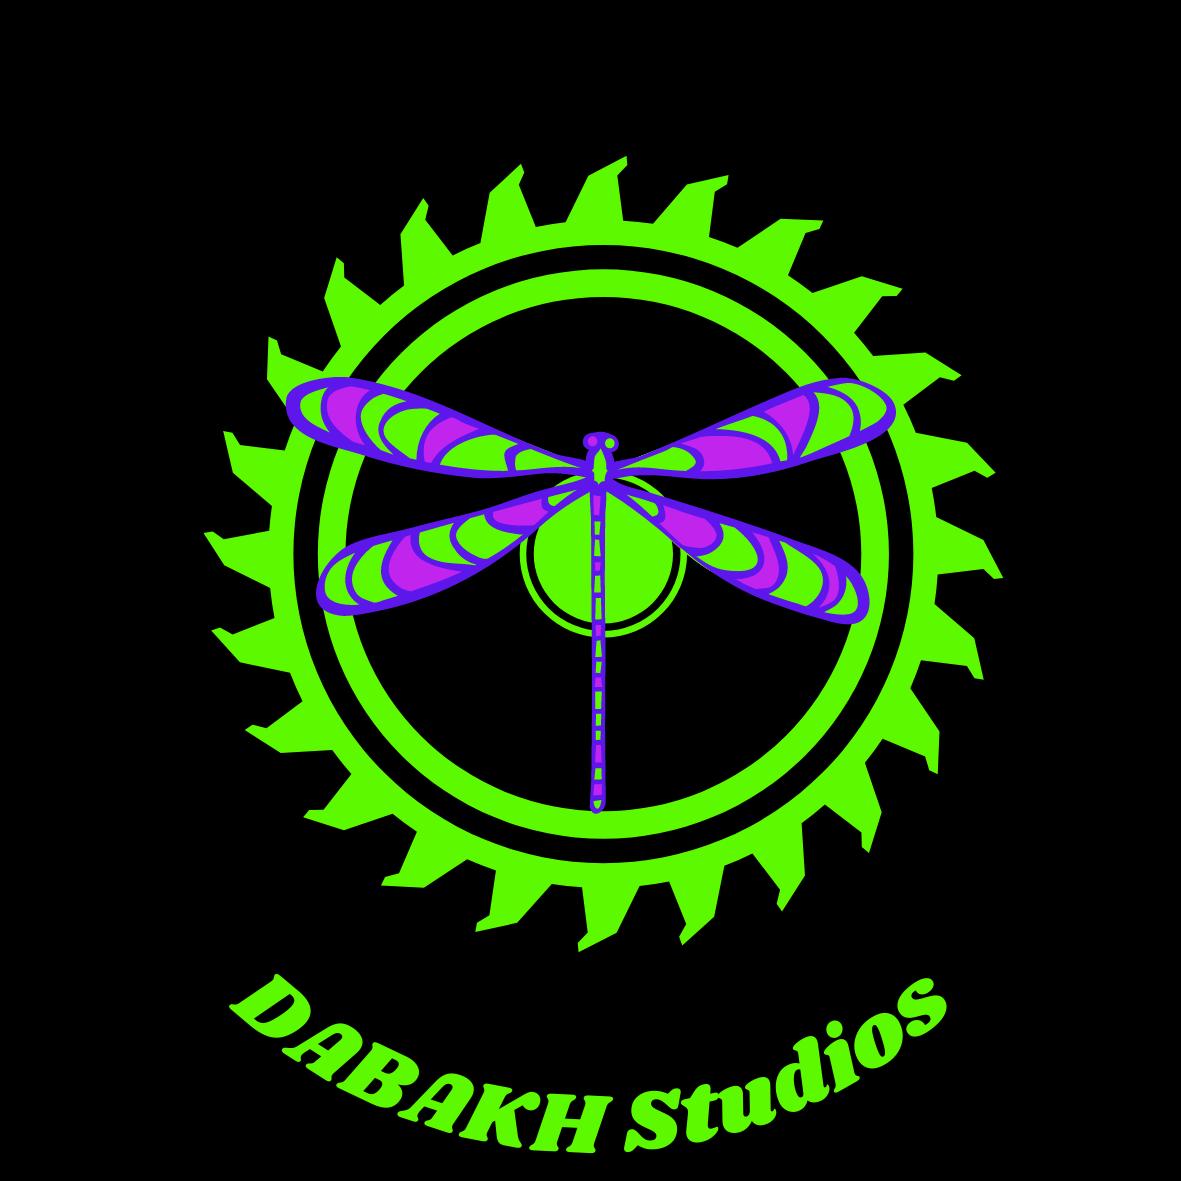 DABAKH Studios